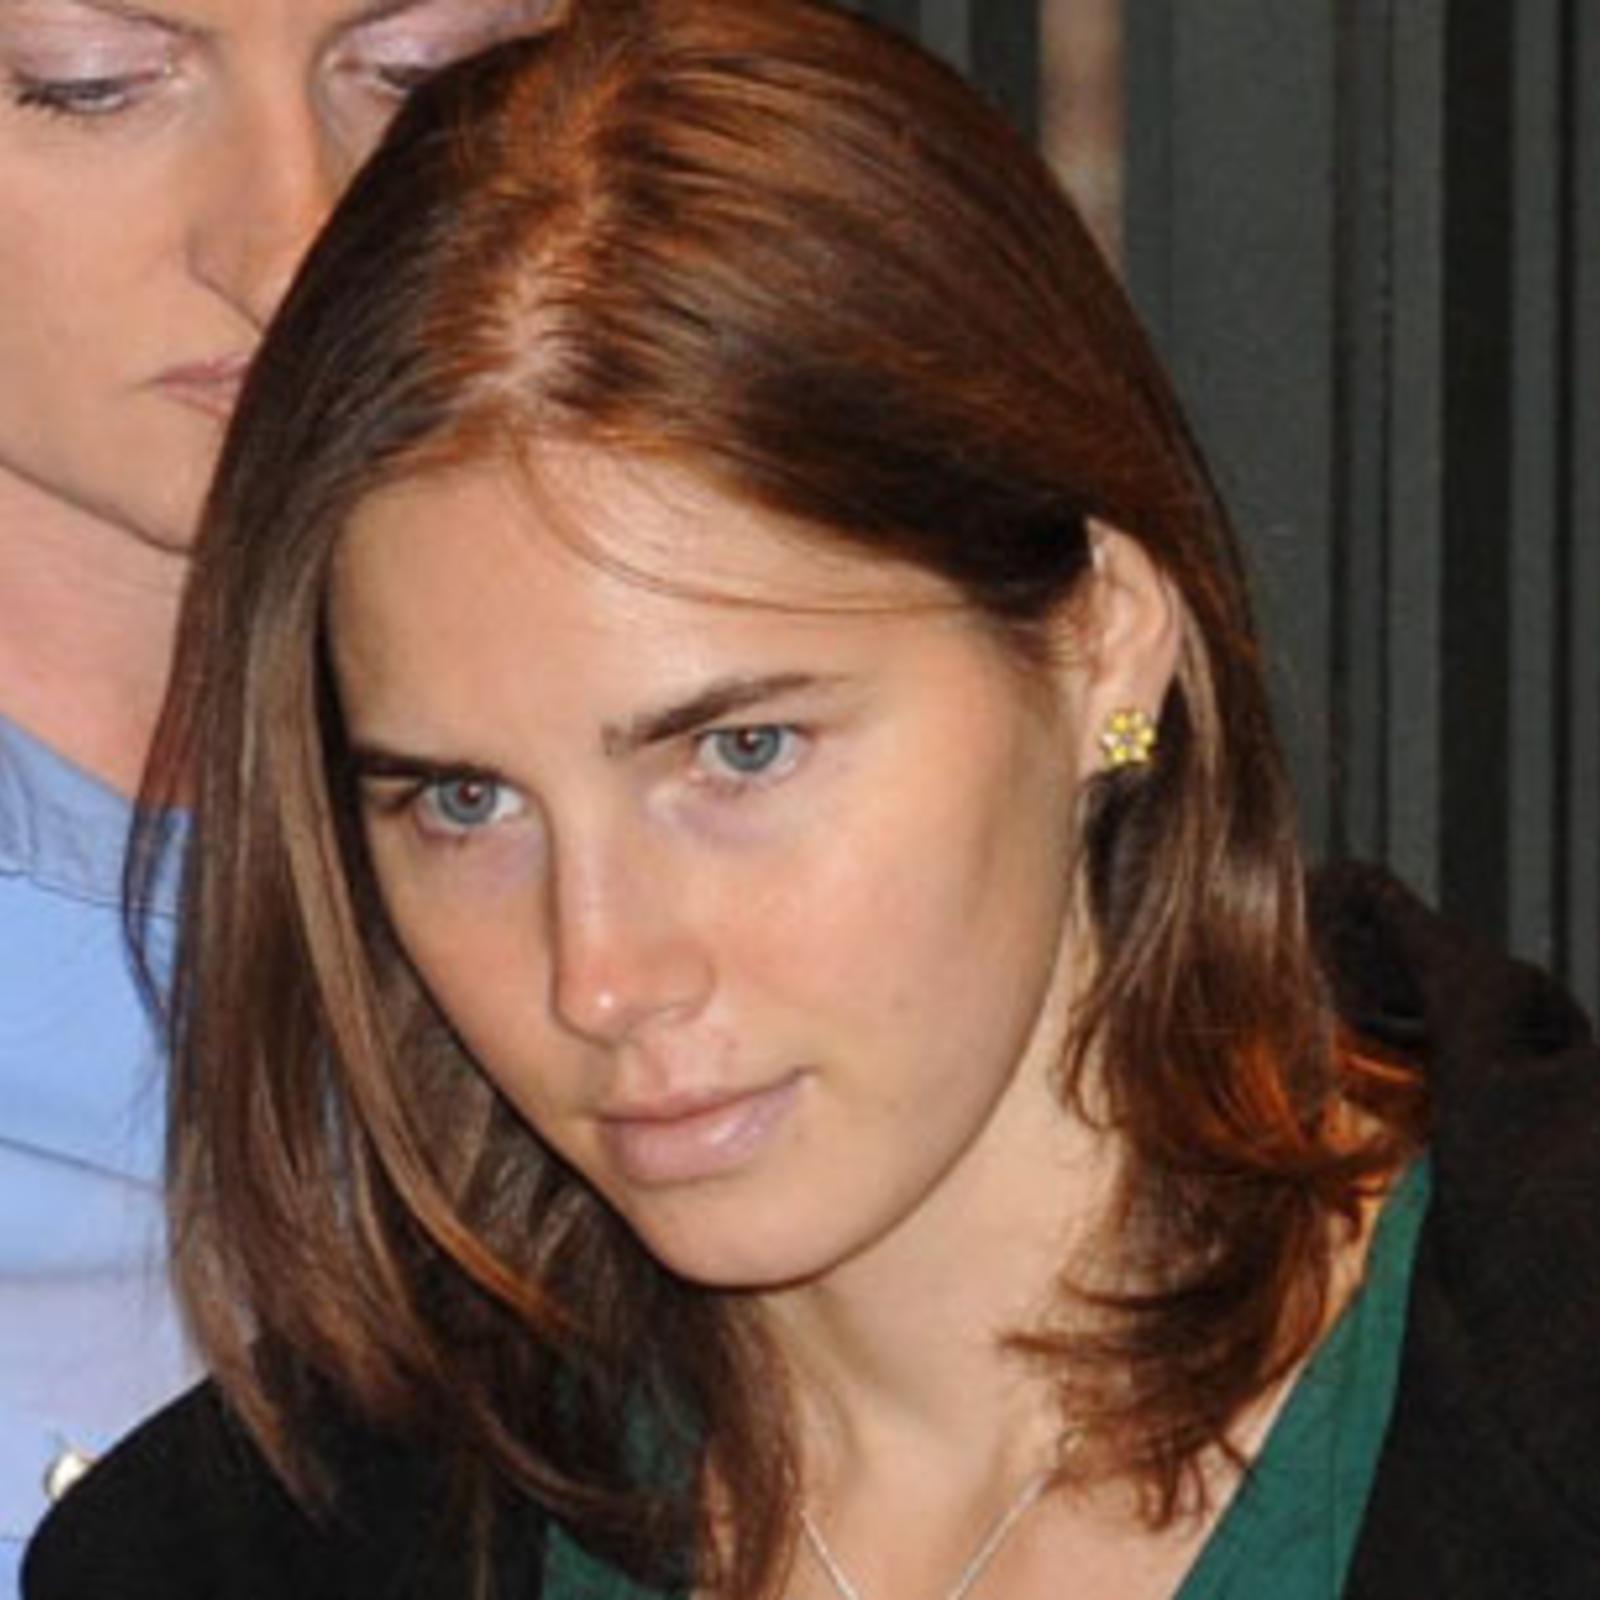 nackt Strand Amanda Amanda Holden